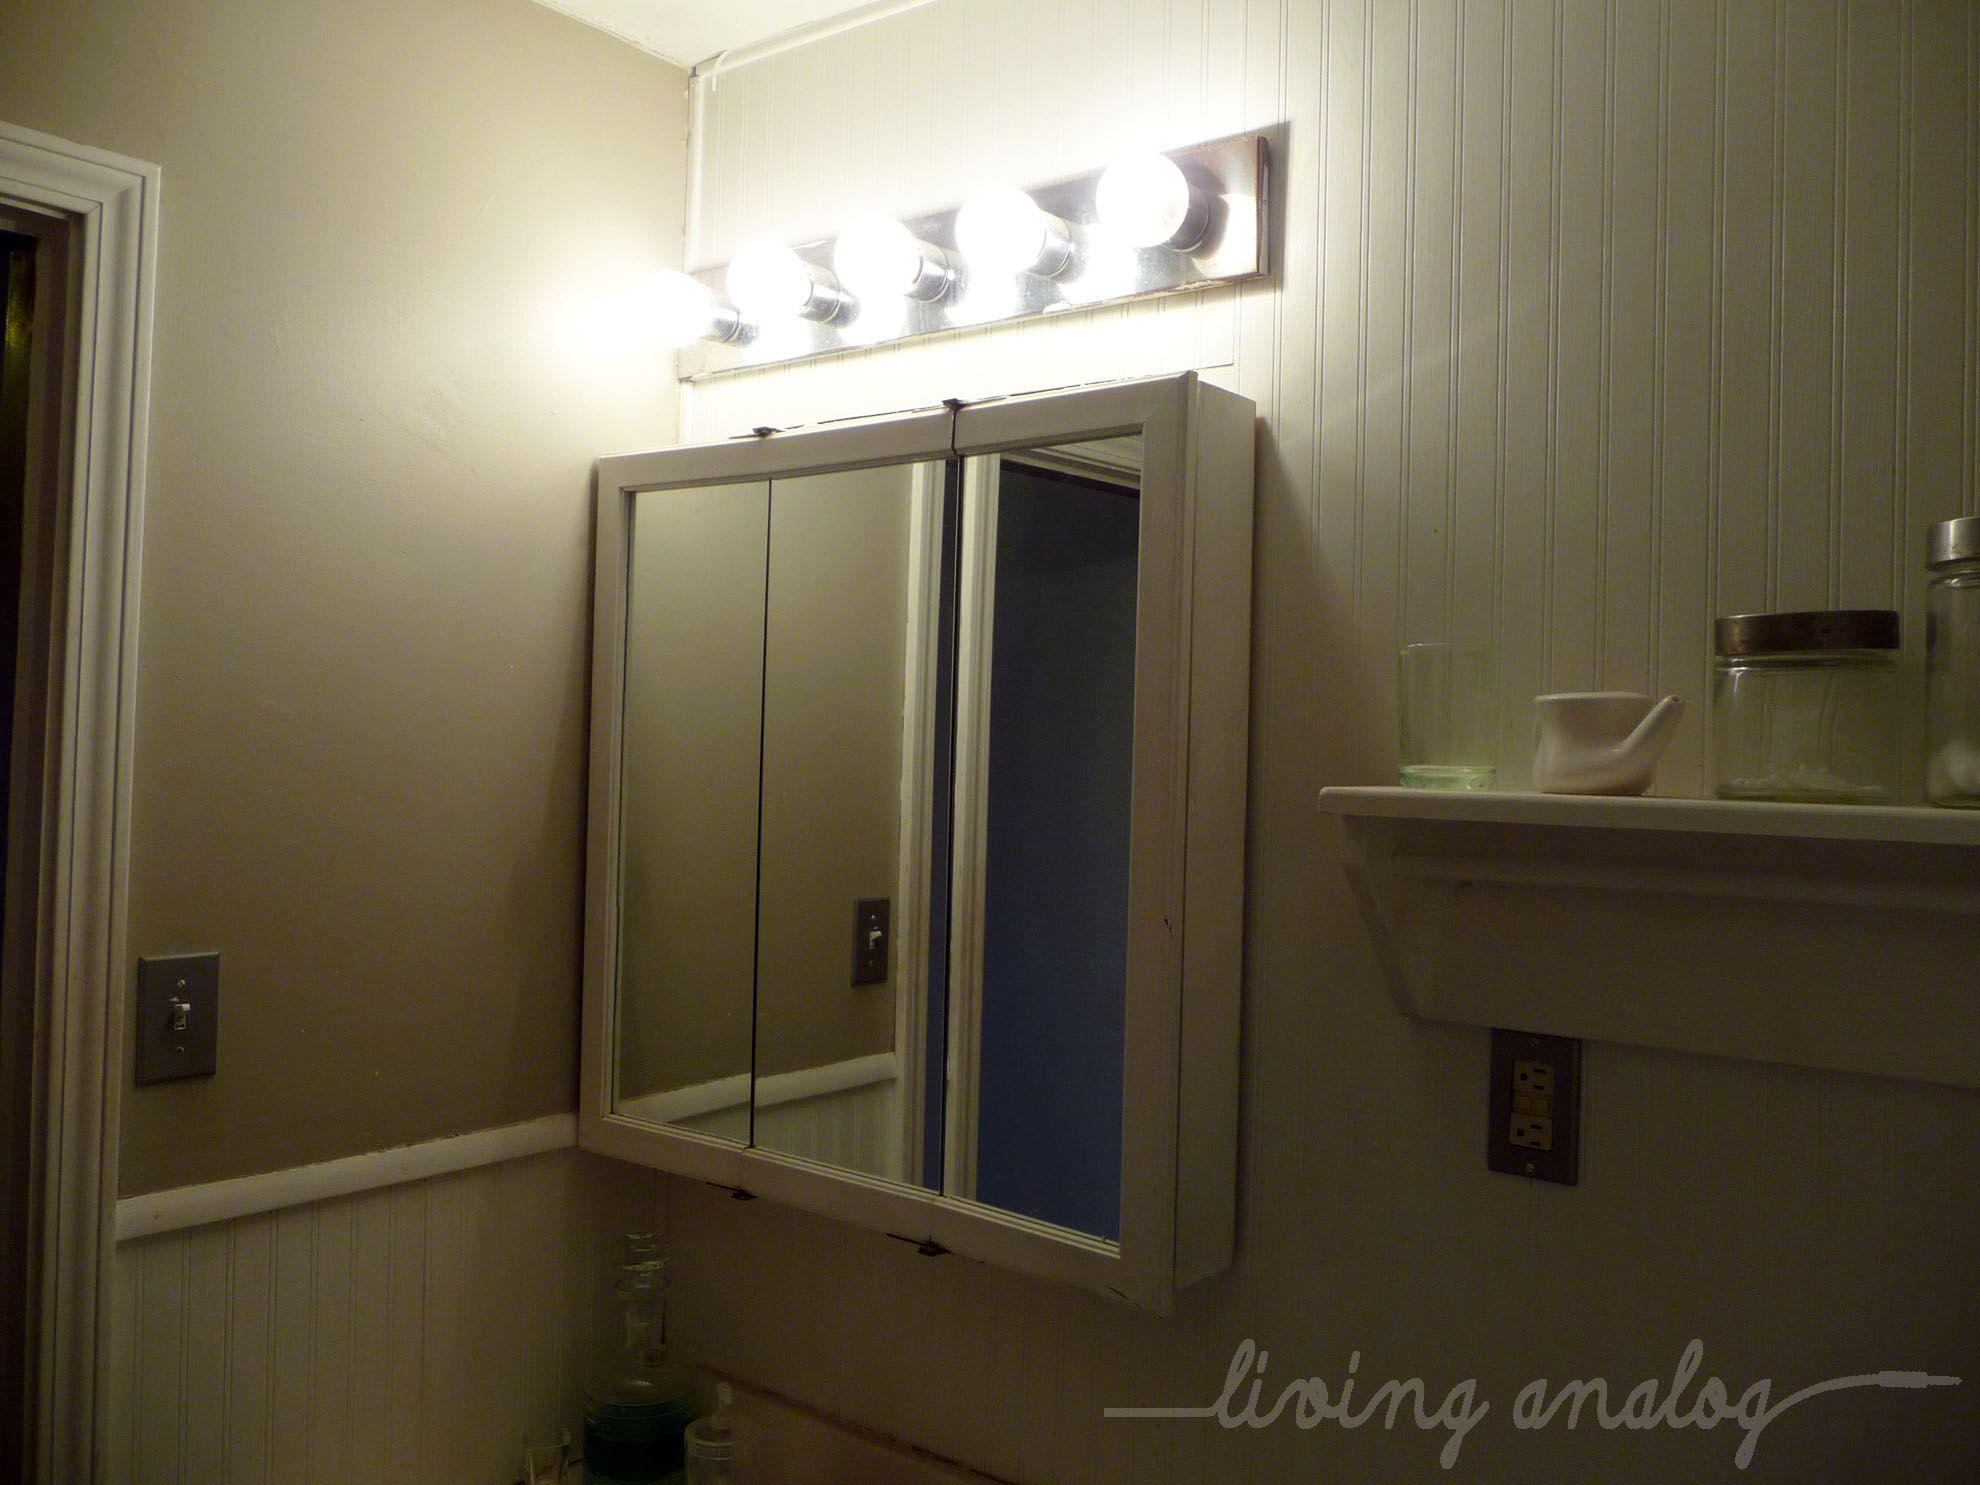 Bathroom Lights Over Medicine Cabinets